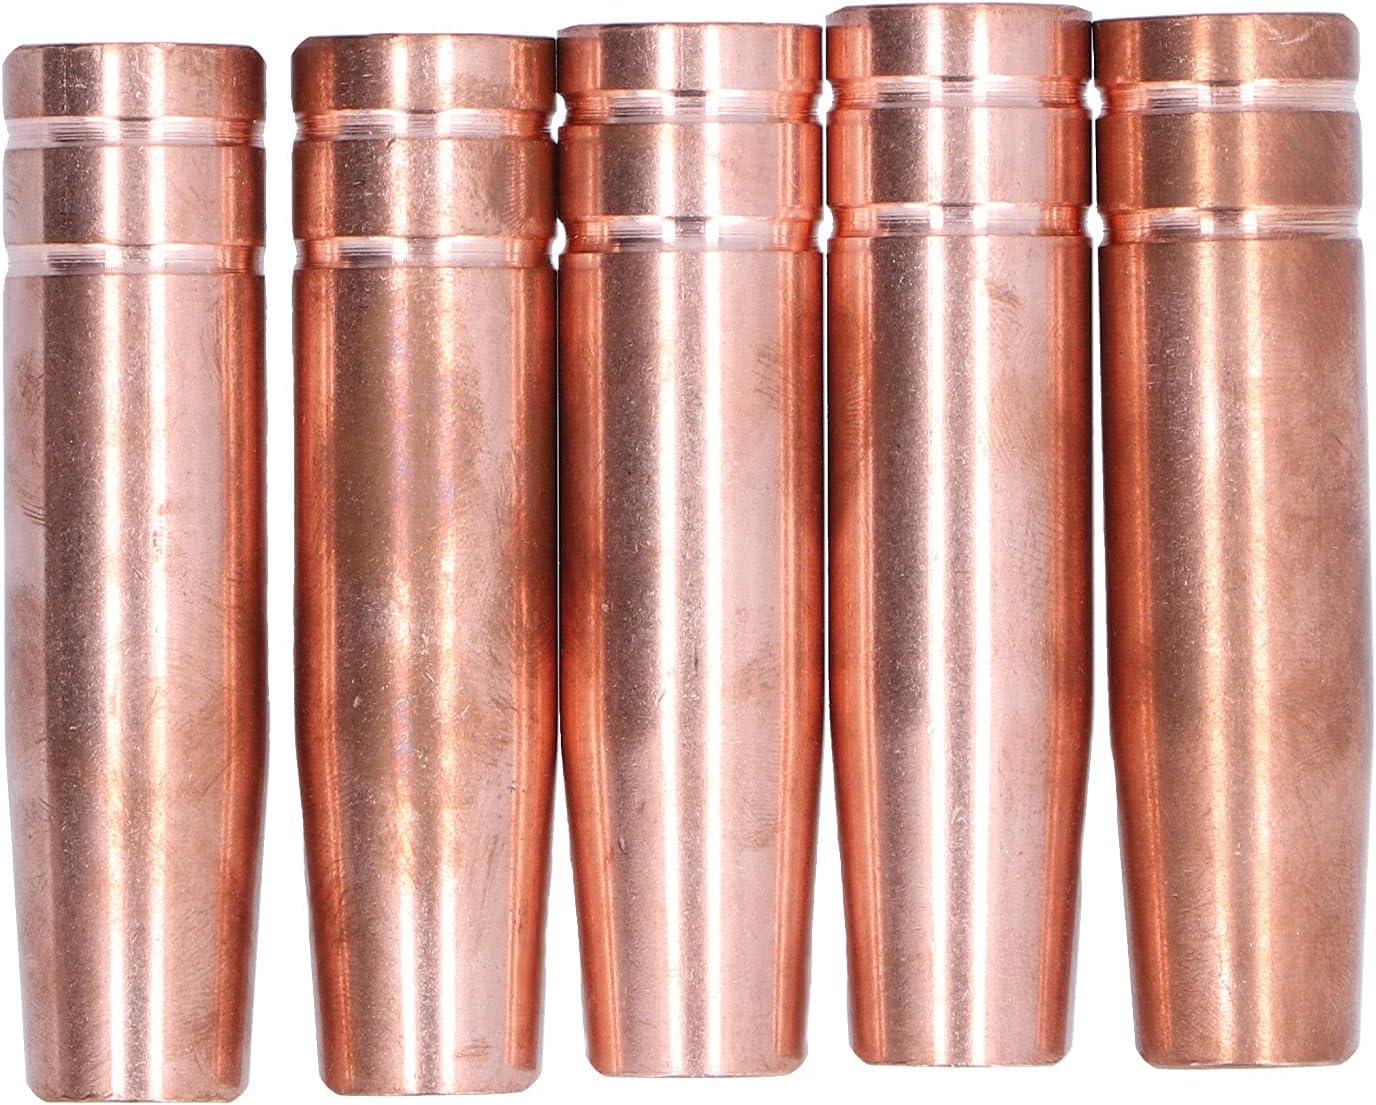 Eujgoov 5Pcs Welding Gas sale Torch Protection Copper Inexpensive Nozzles